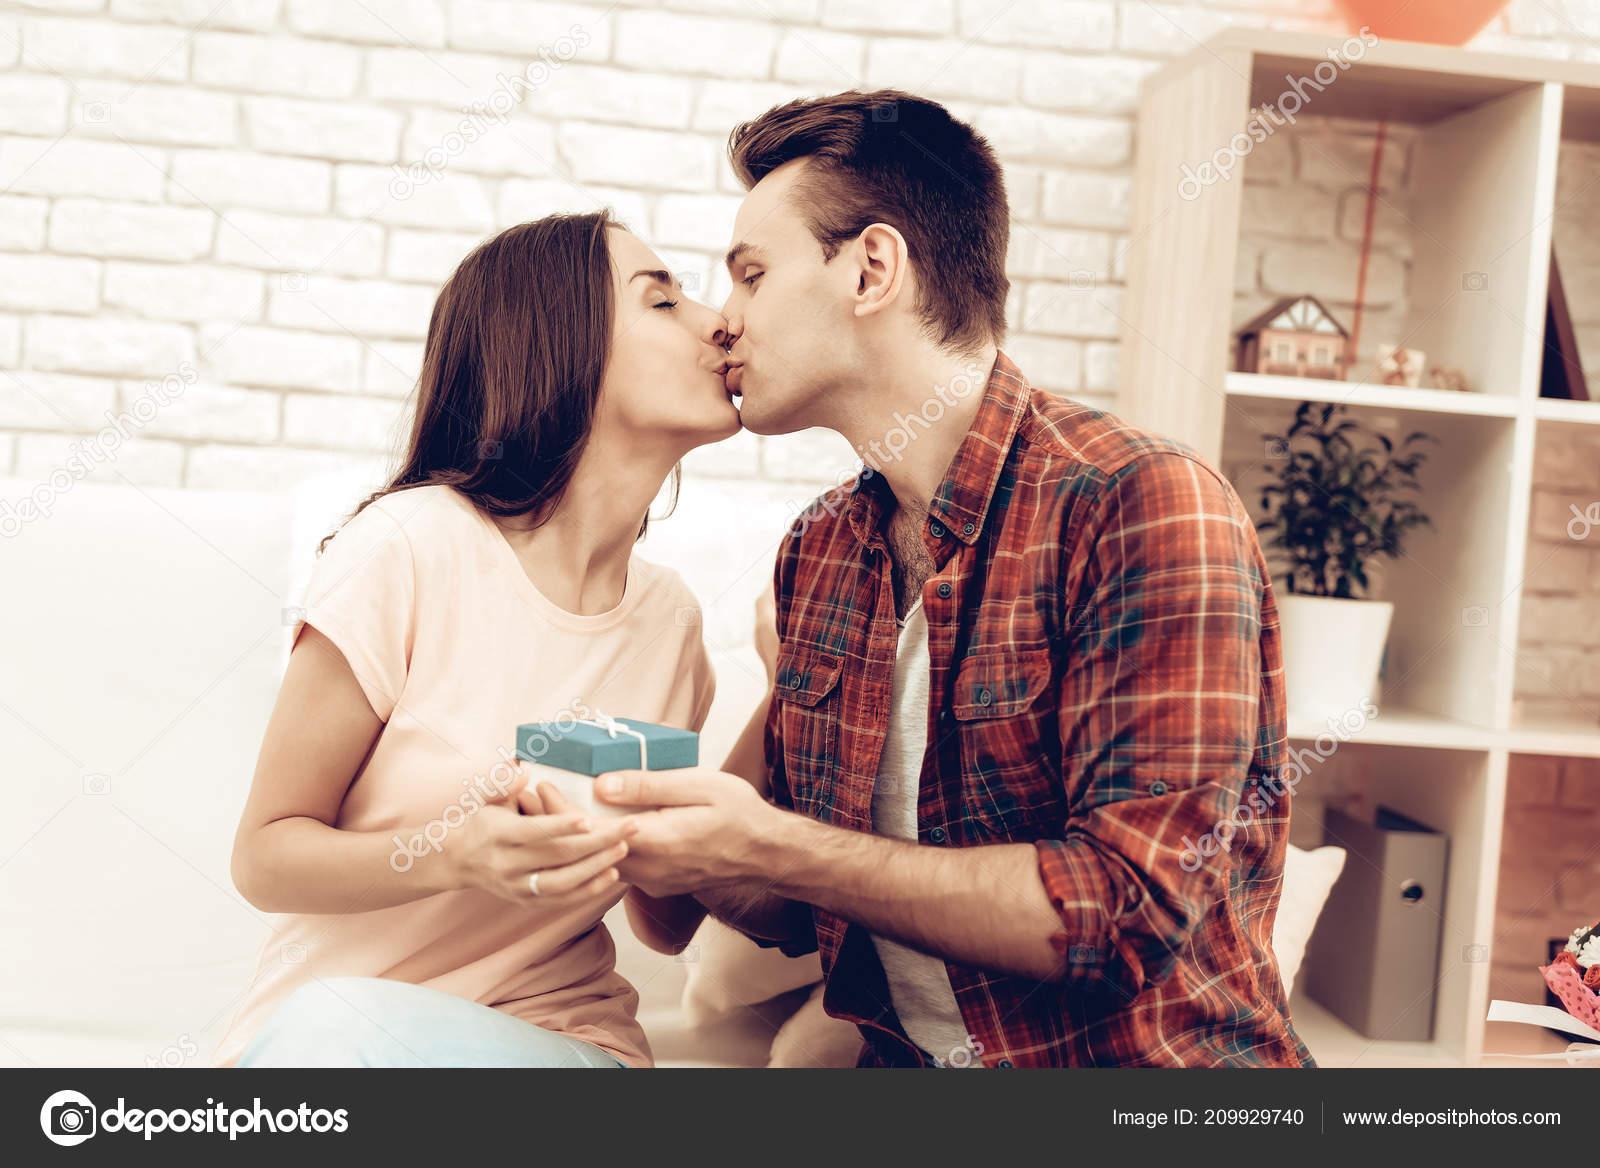 Dating τύπος από την εργασία Σαν Ντιέγκο κόμικ απάτη ταχύτητα dating